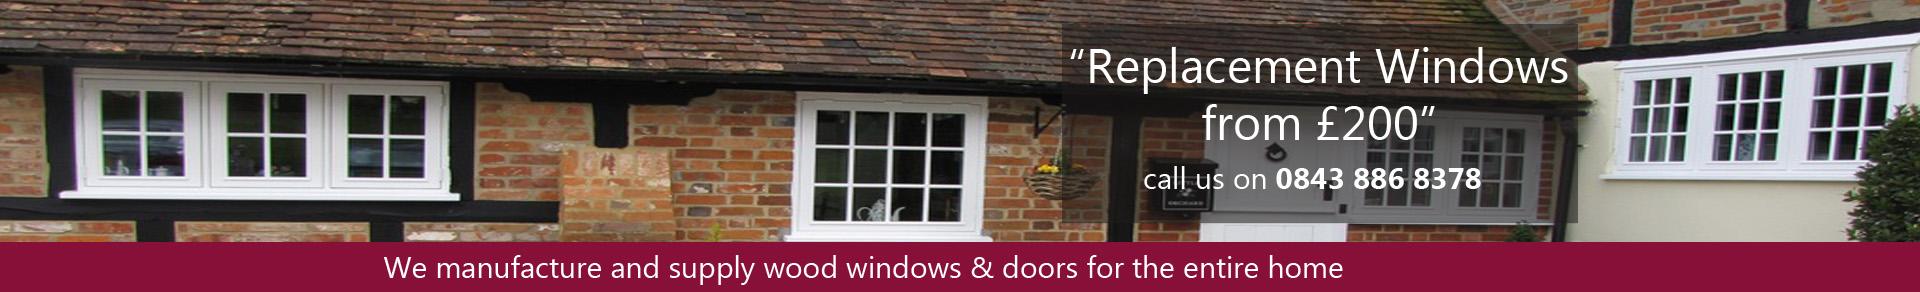 replacement-windows-header